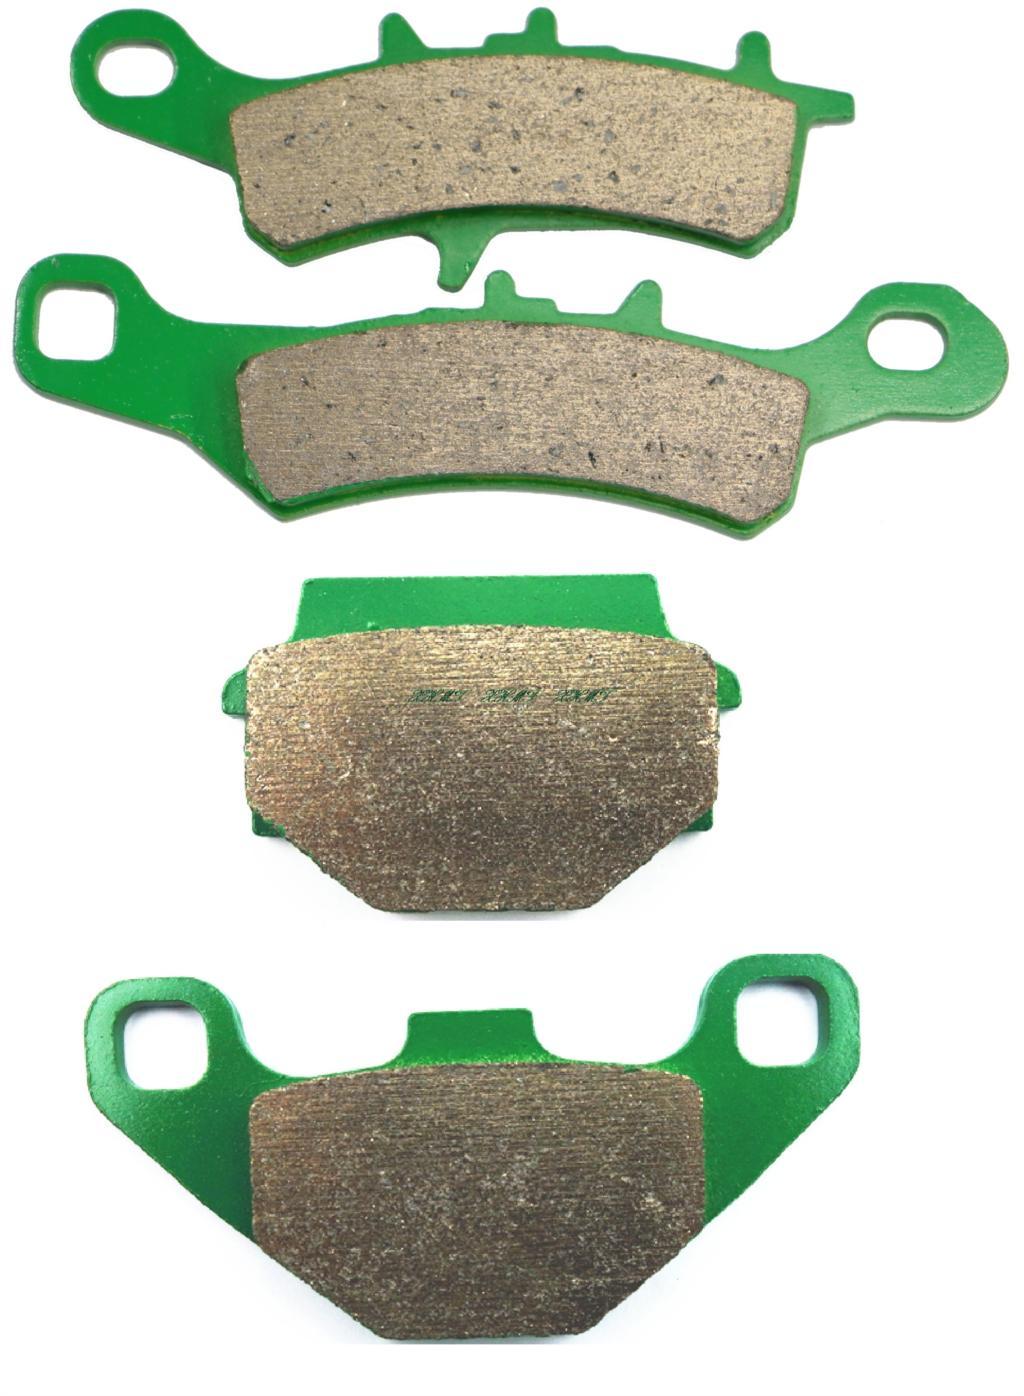 Disc Brake Pads Set For Kawasaki Klx250 Klx 250 H1 Super Sherpa 1998 1999 2000 2001 2002 2003 2004 2005 / Super Sherpa 2000 &Up